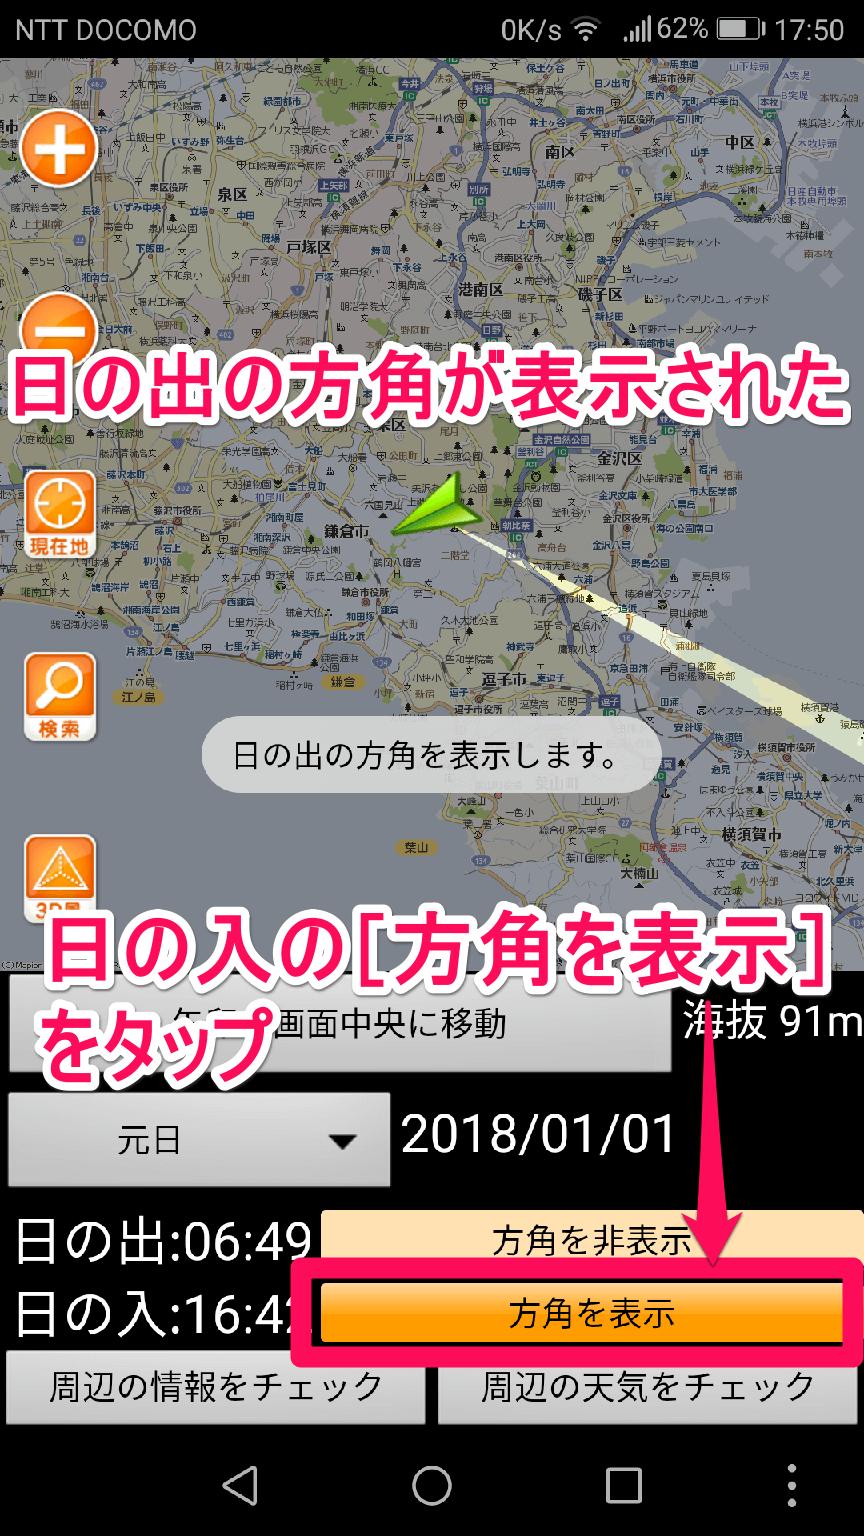 Android(アンドロイド)版[日の出日の入マピオン]アプリで初日の出の方角を表示した画面